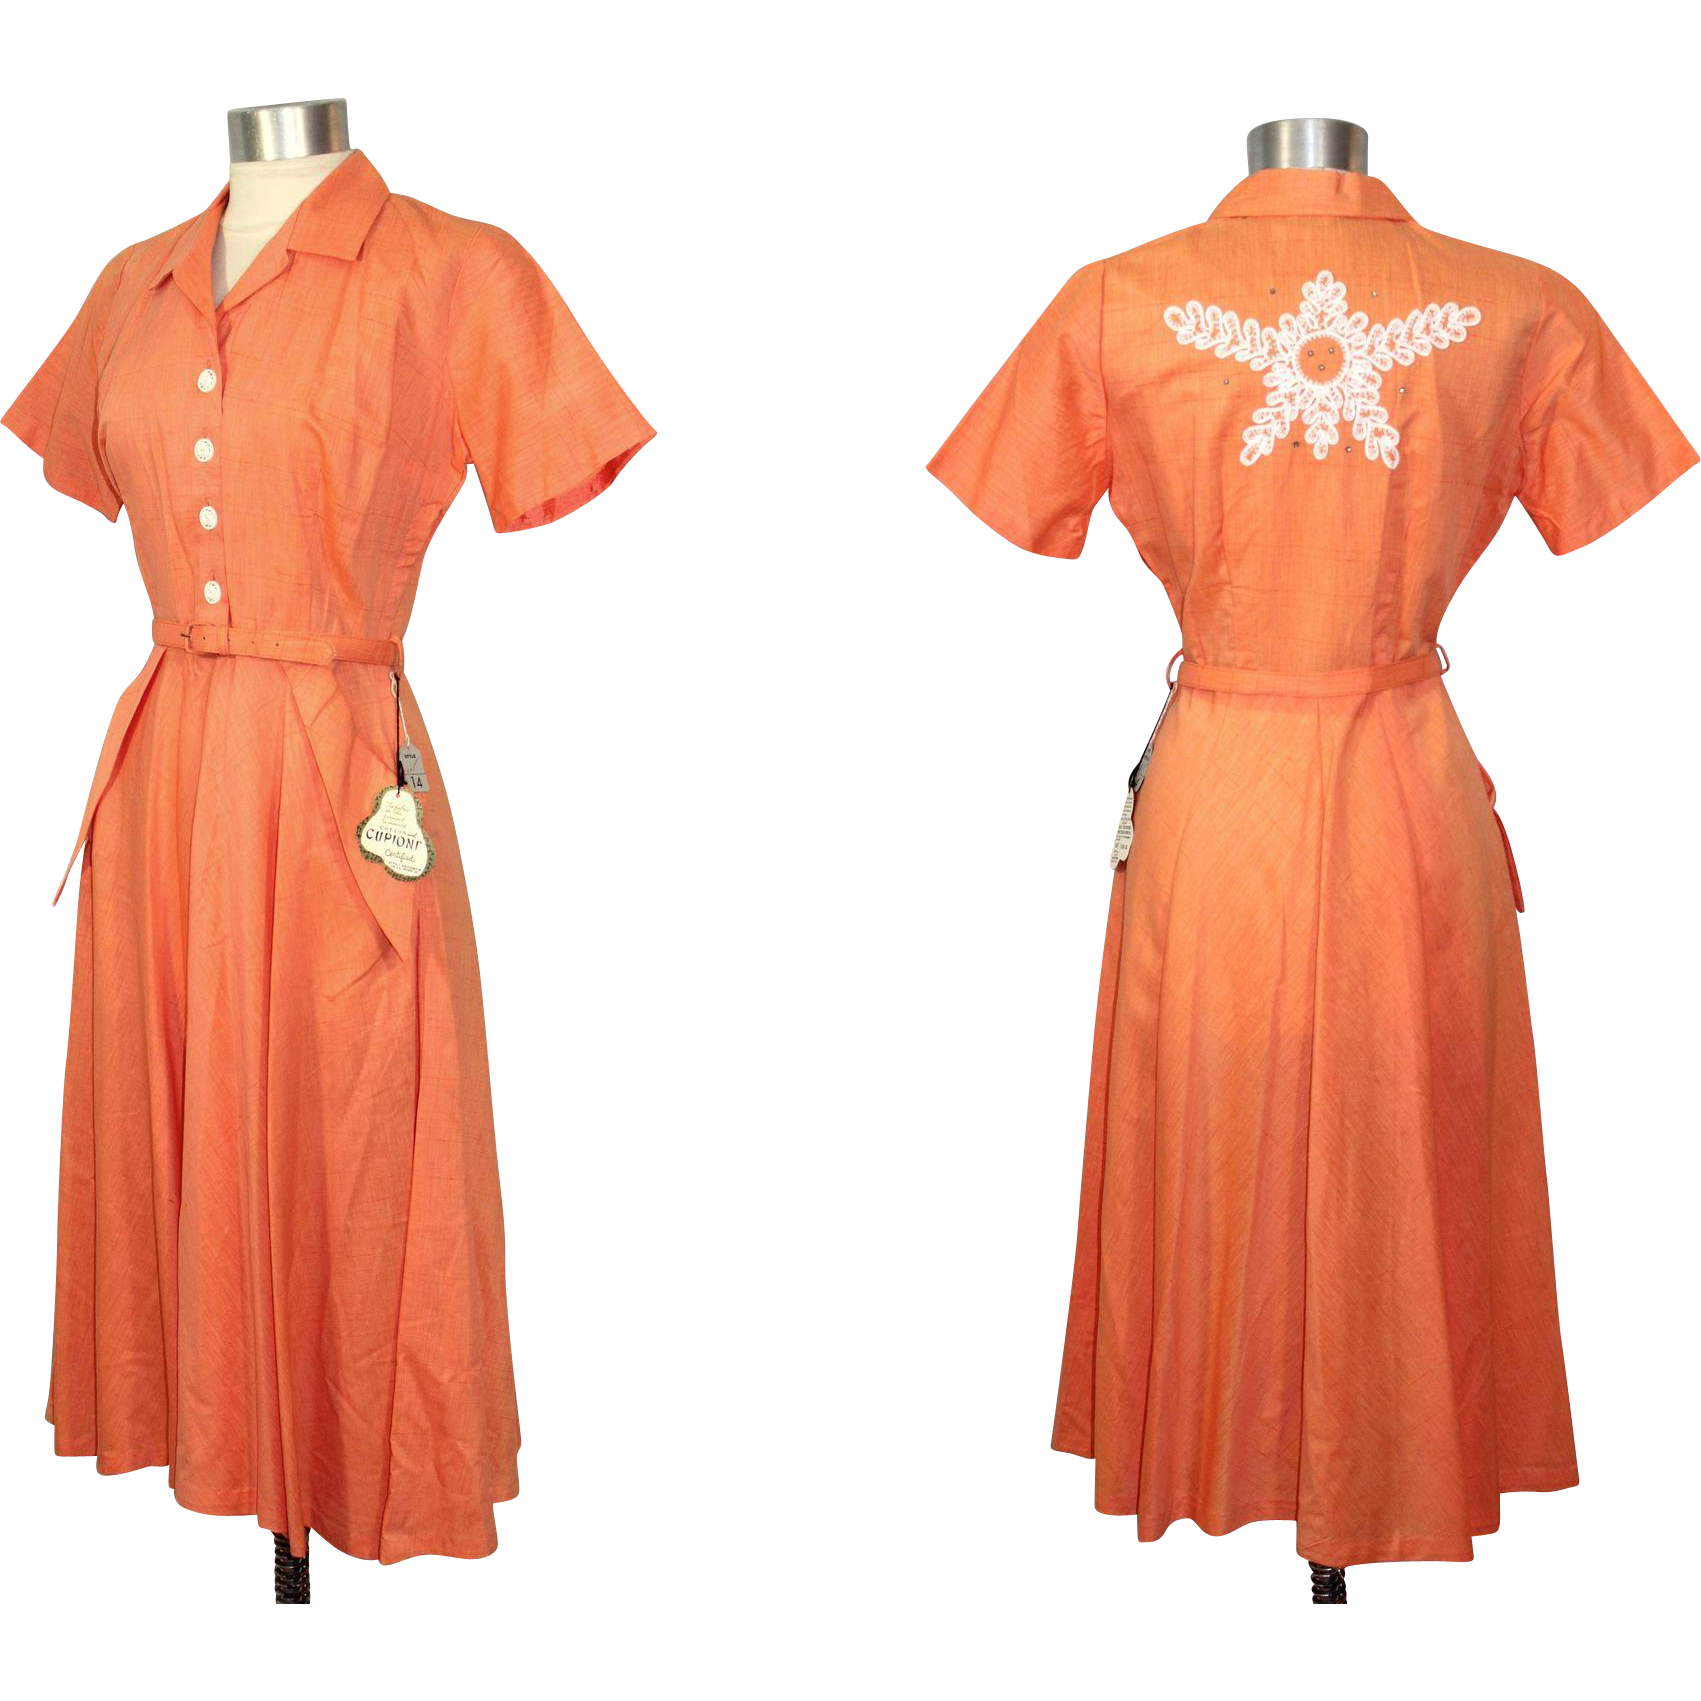 Vintage 1950s NOS Orange Cupioni & Cotton Dress w/Back Detail M